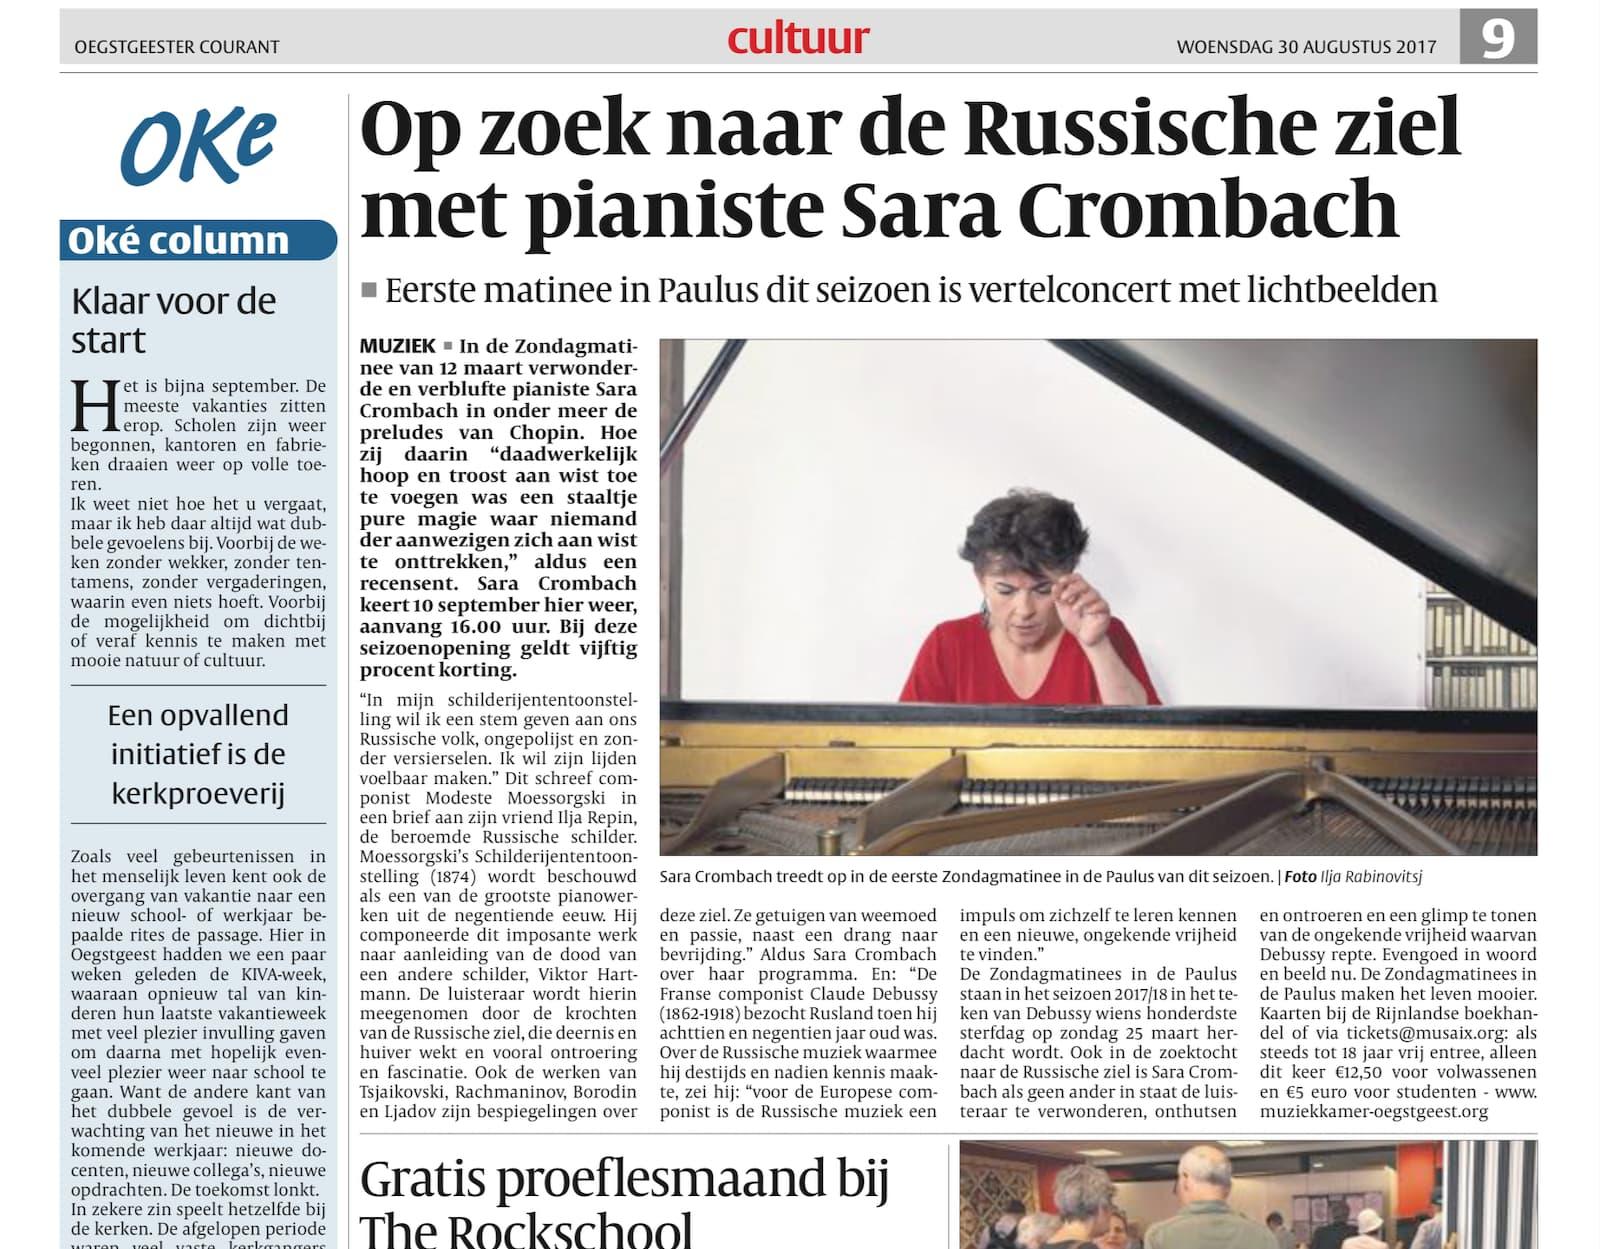 Sara Crombach Artikel 30-08-2017